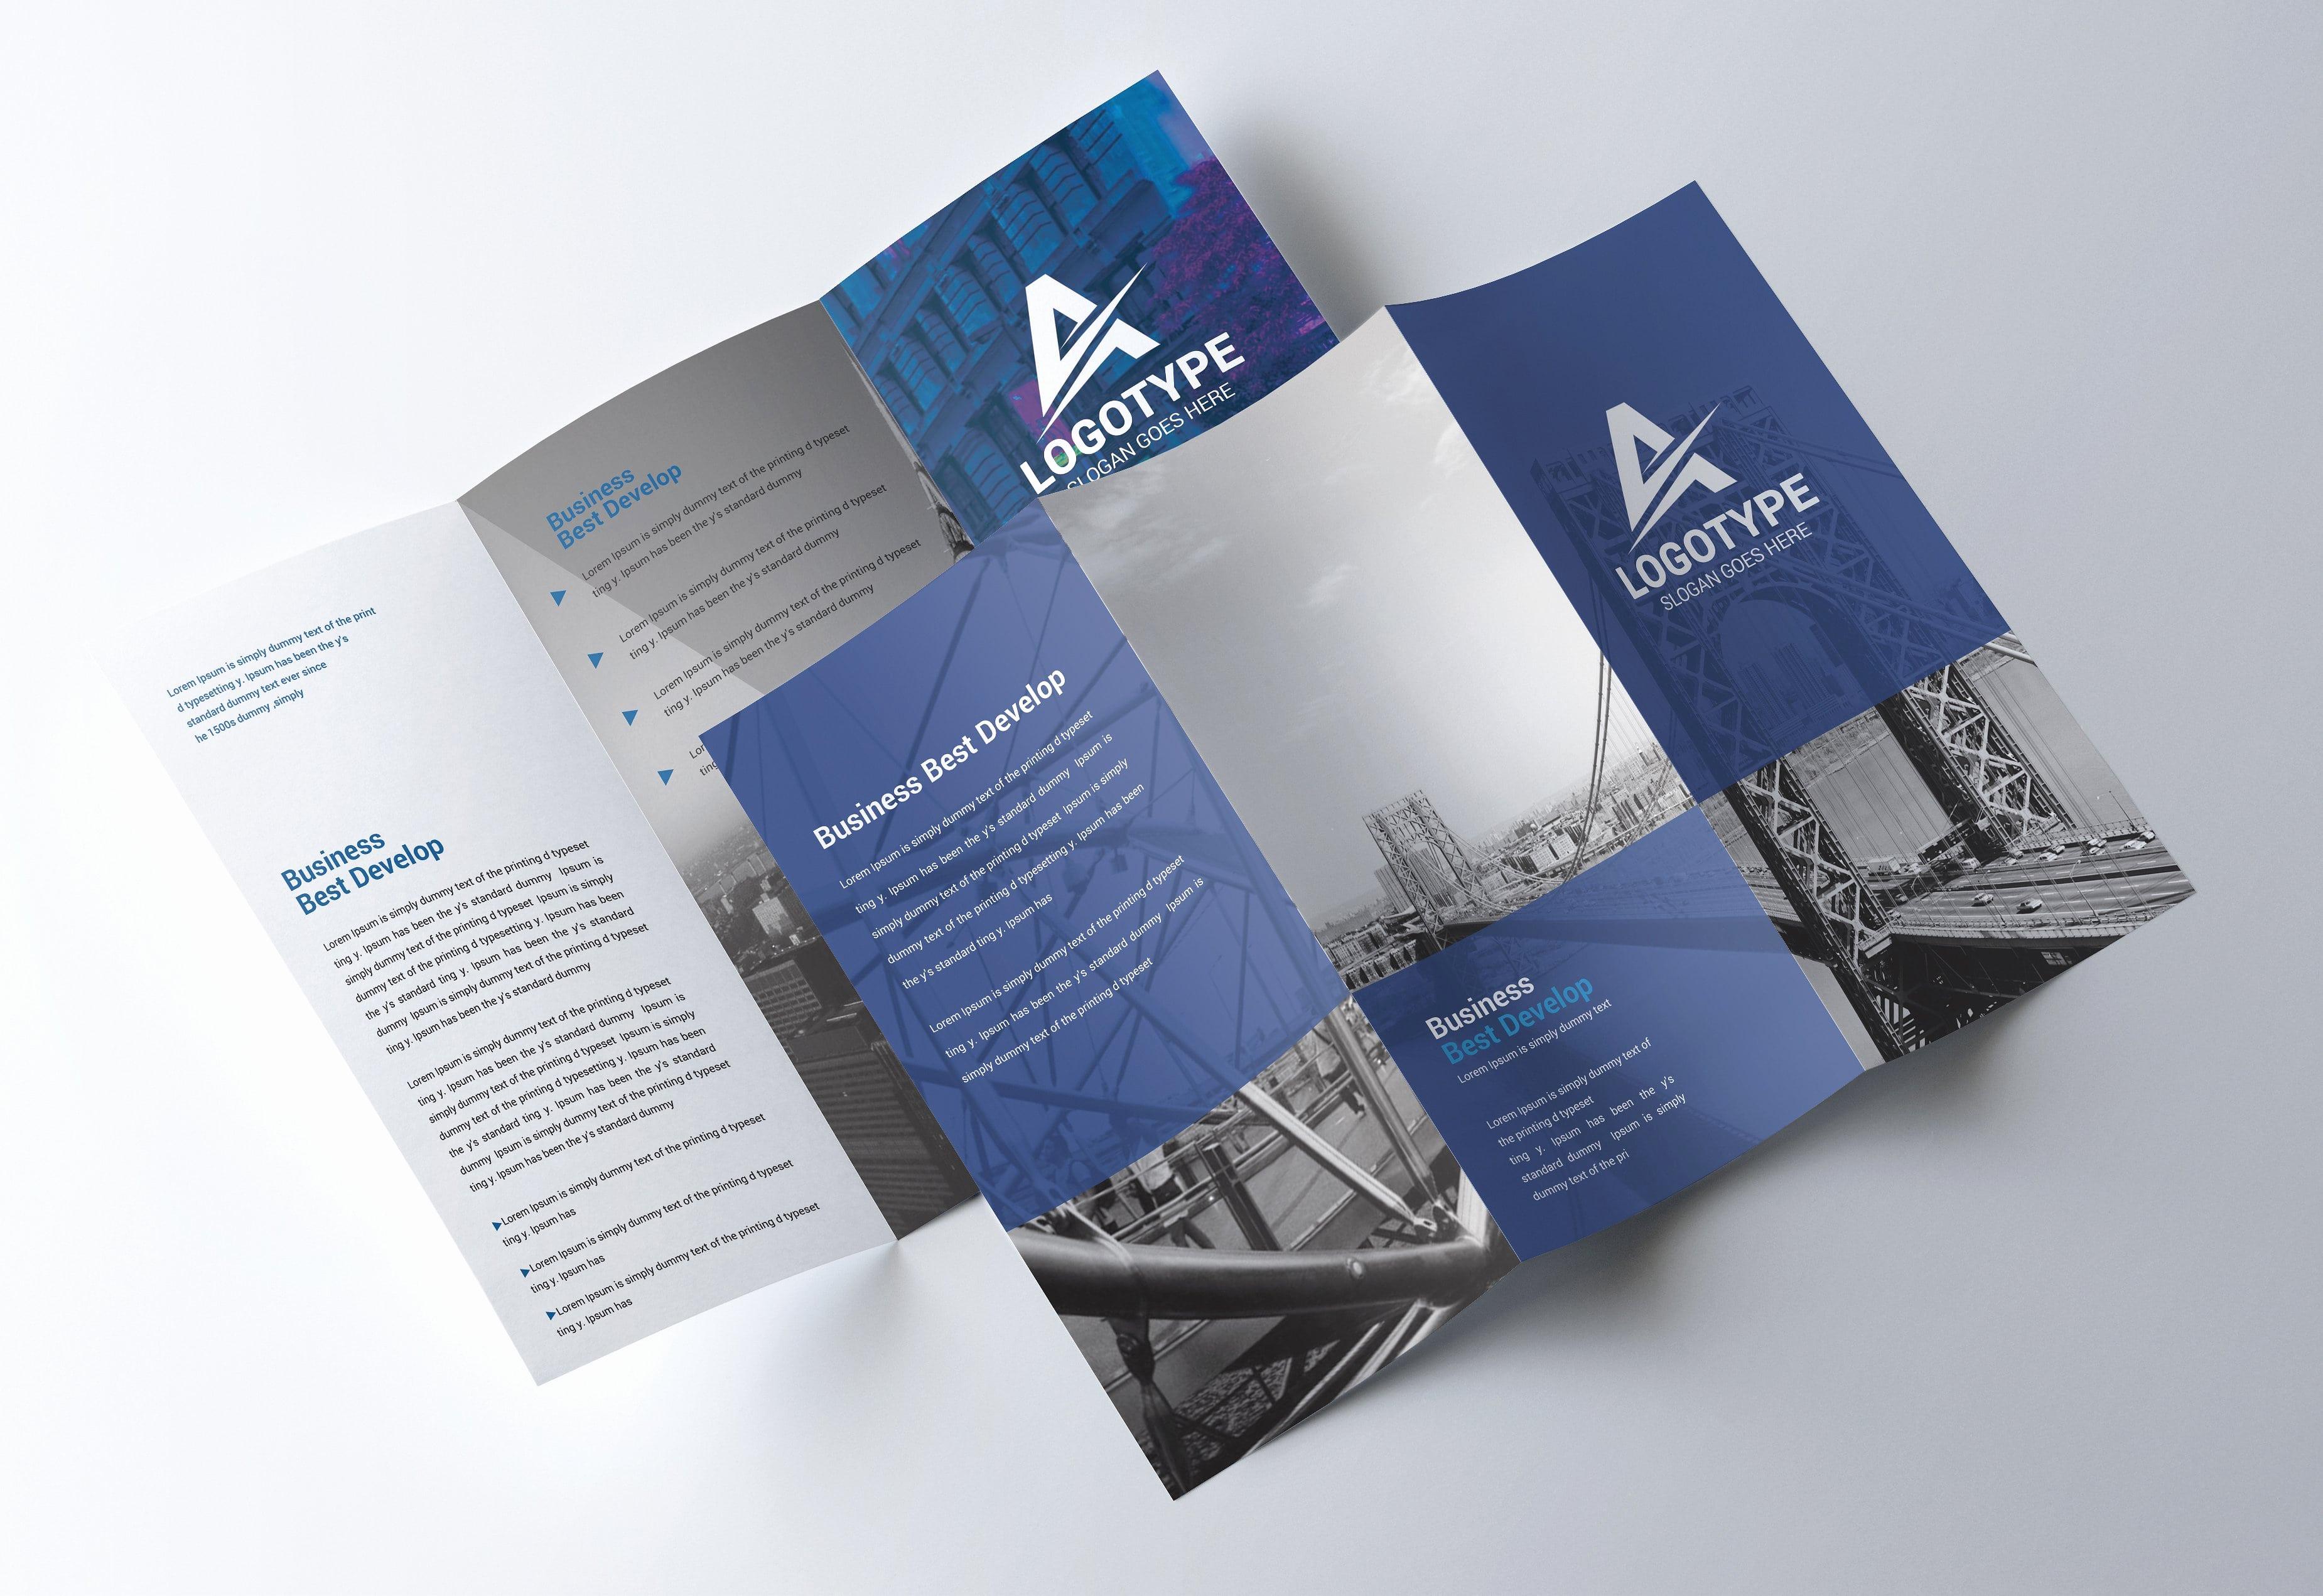 Tri Fold Brochure Template Psd Elegant Corporate Tri Fold Brochure Psd Template Free Psd